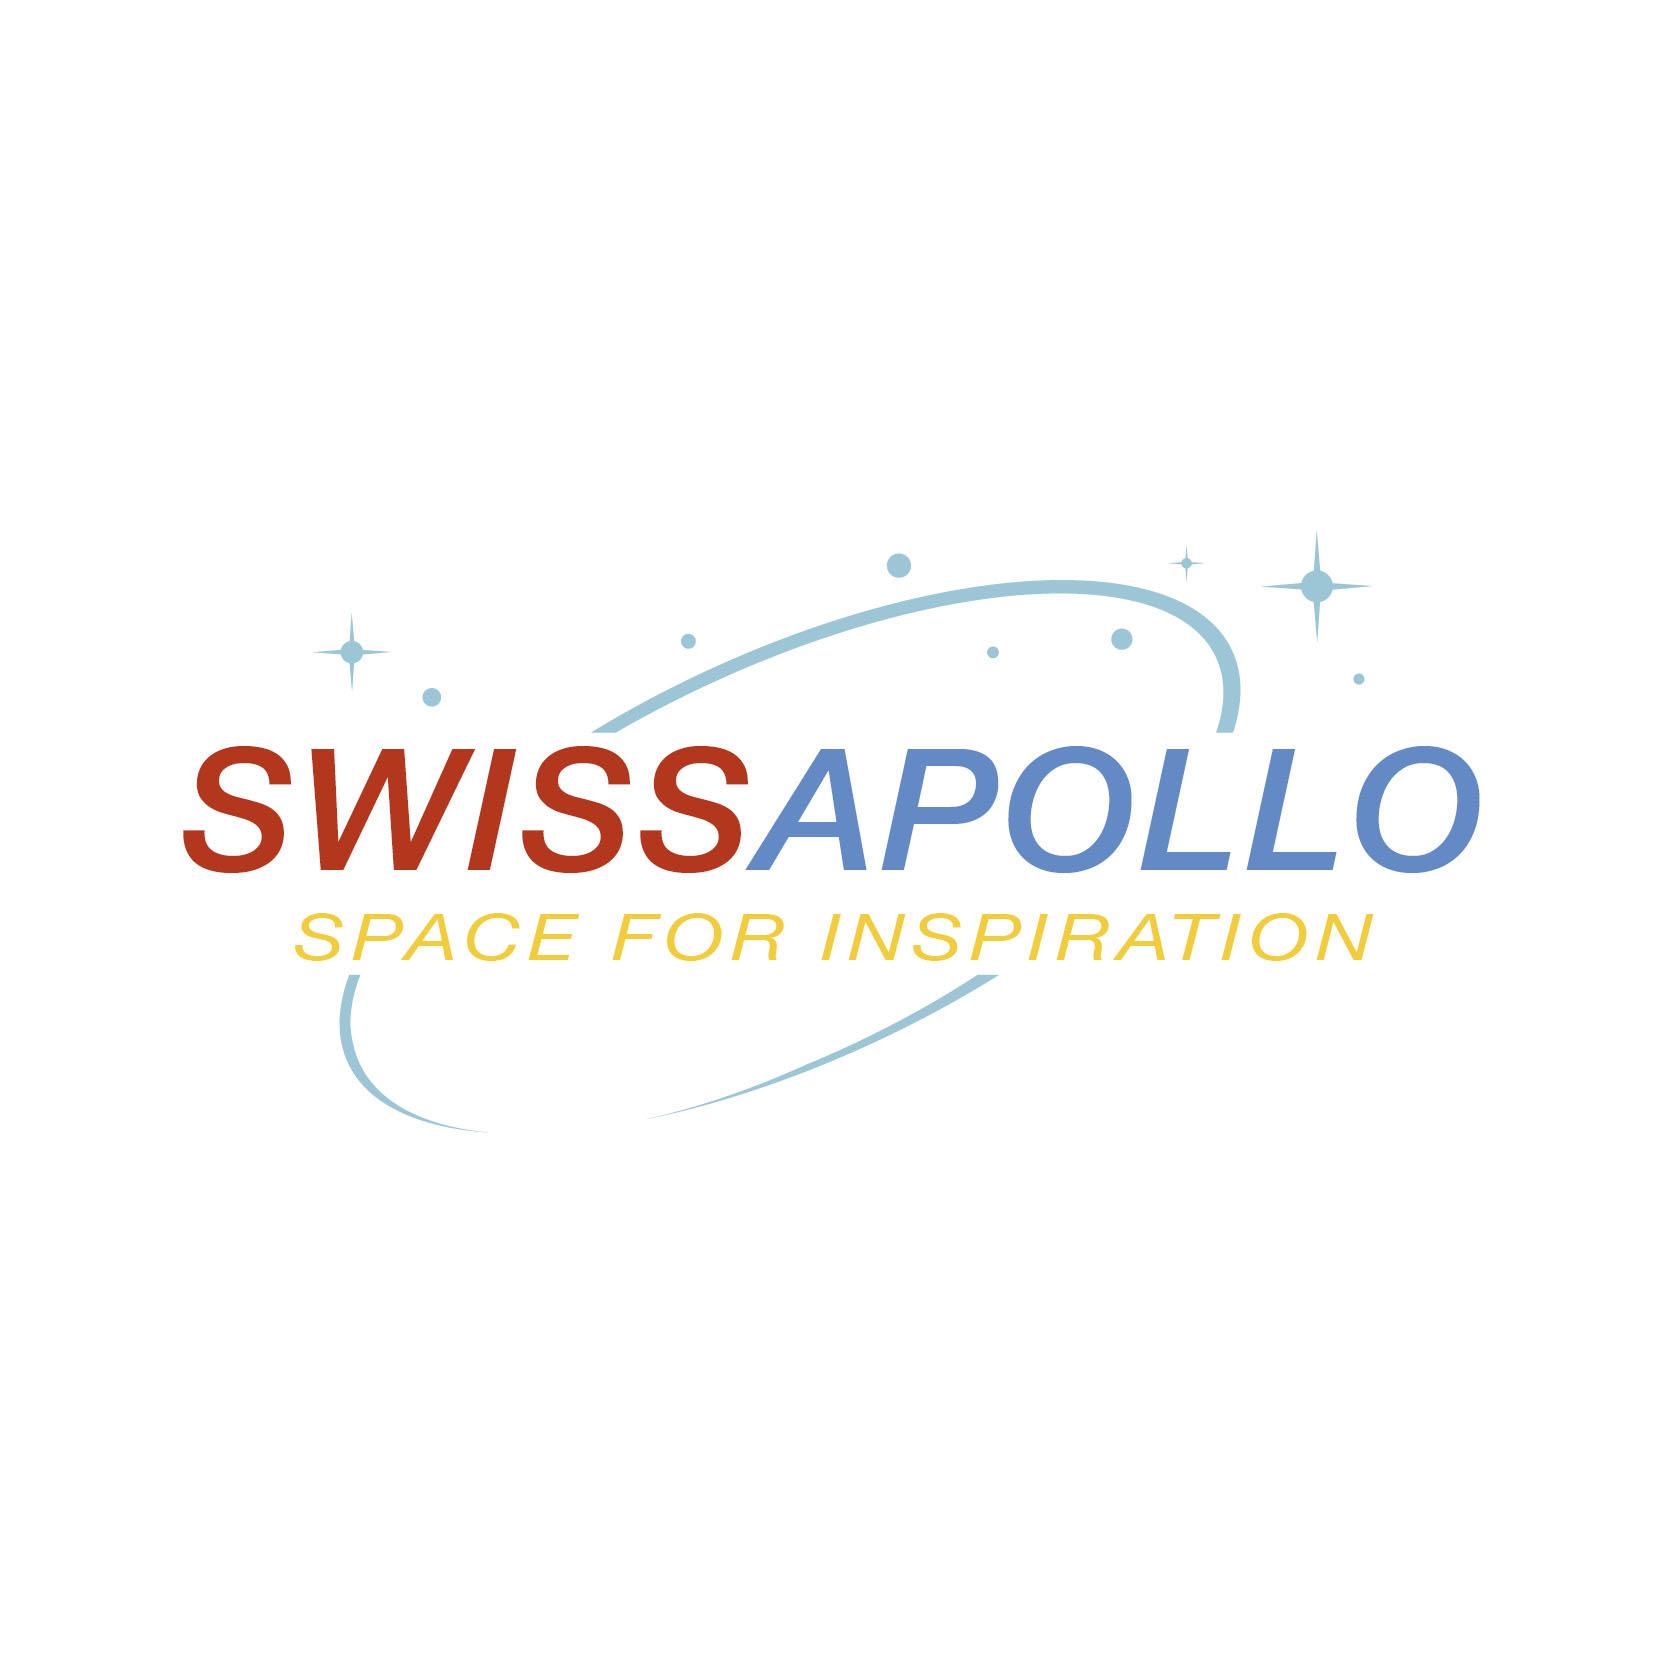 SwissApollo